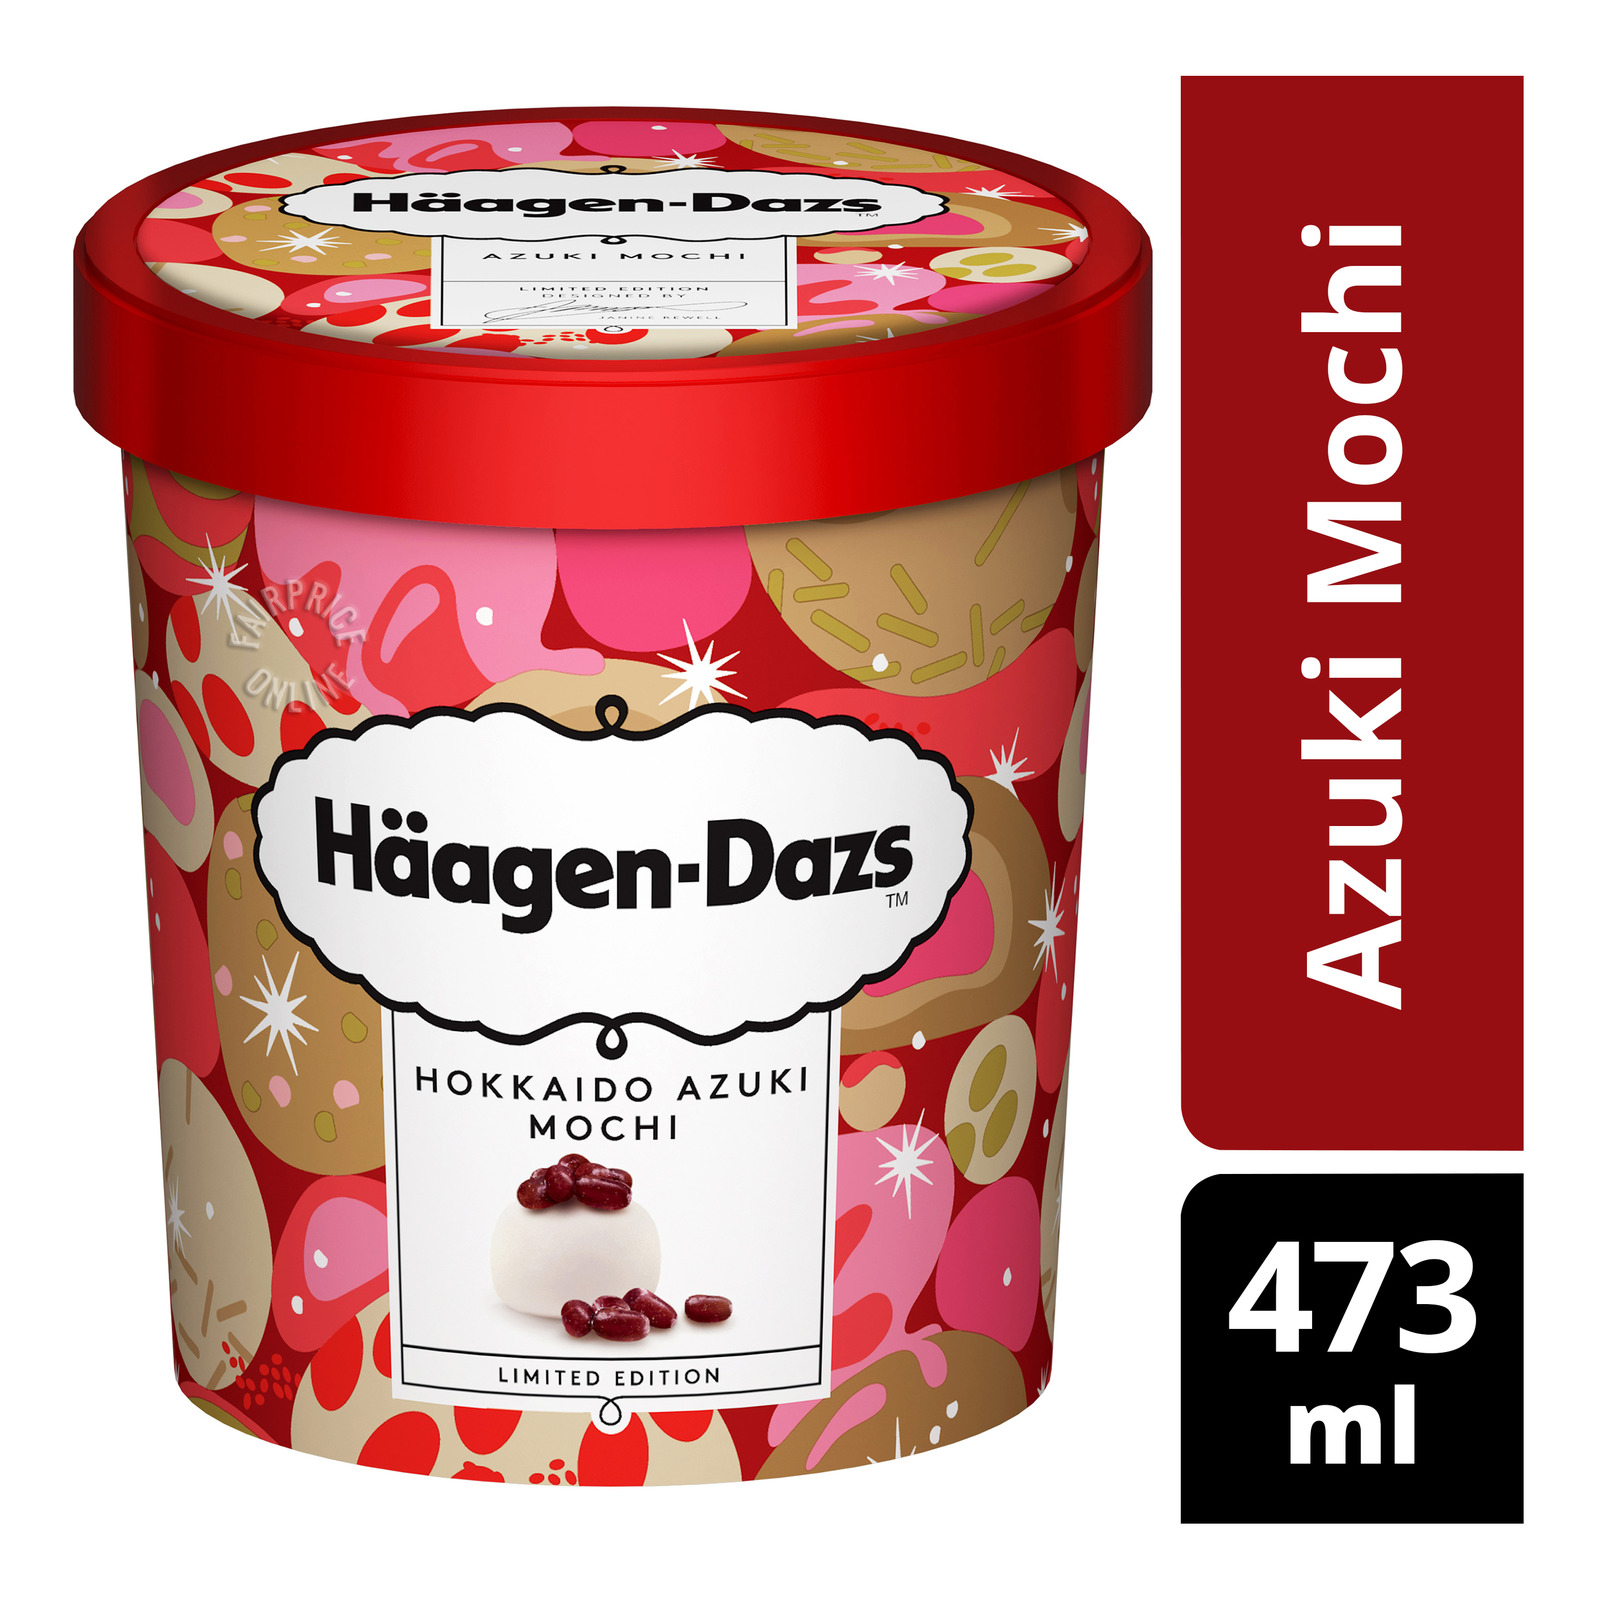 Haagen-Dazs Ice Cream - Azuki Mochi